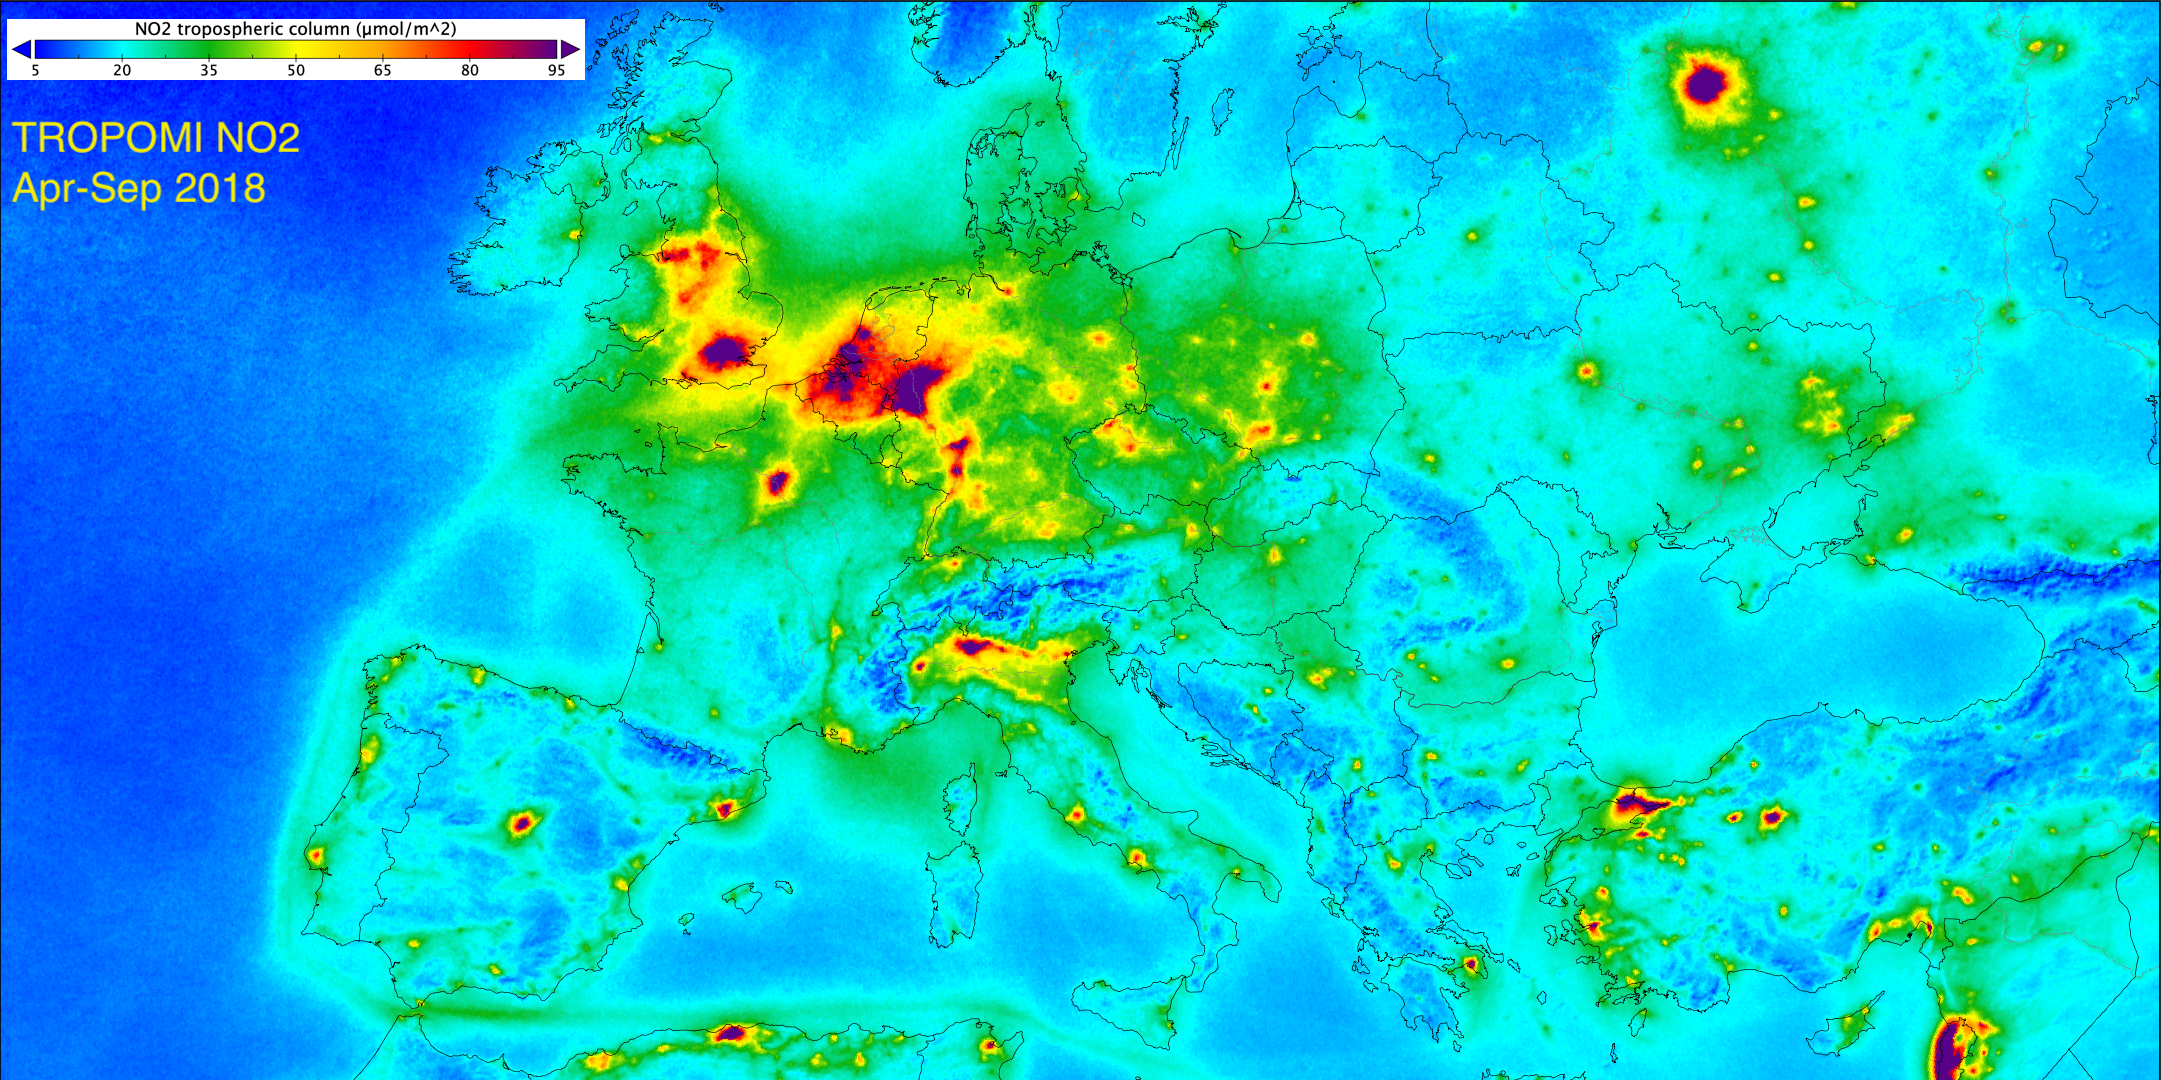 Seasonal average NO2 tropospheric column map at horizontal resolution of 2 km